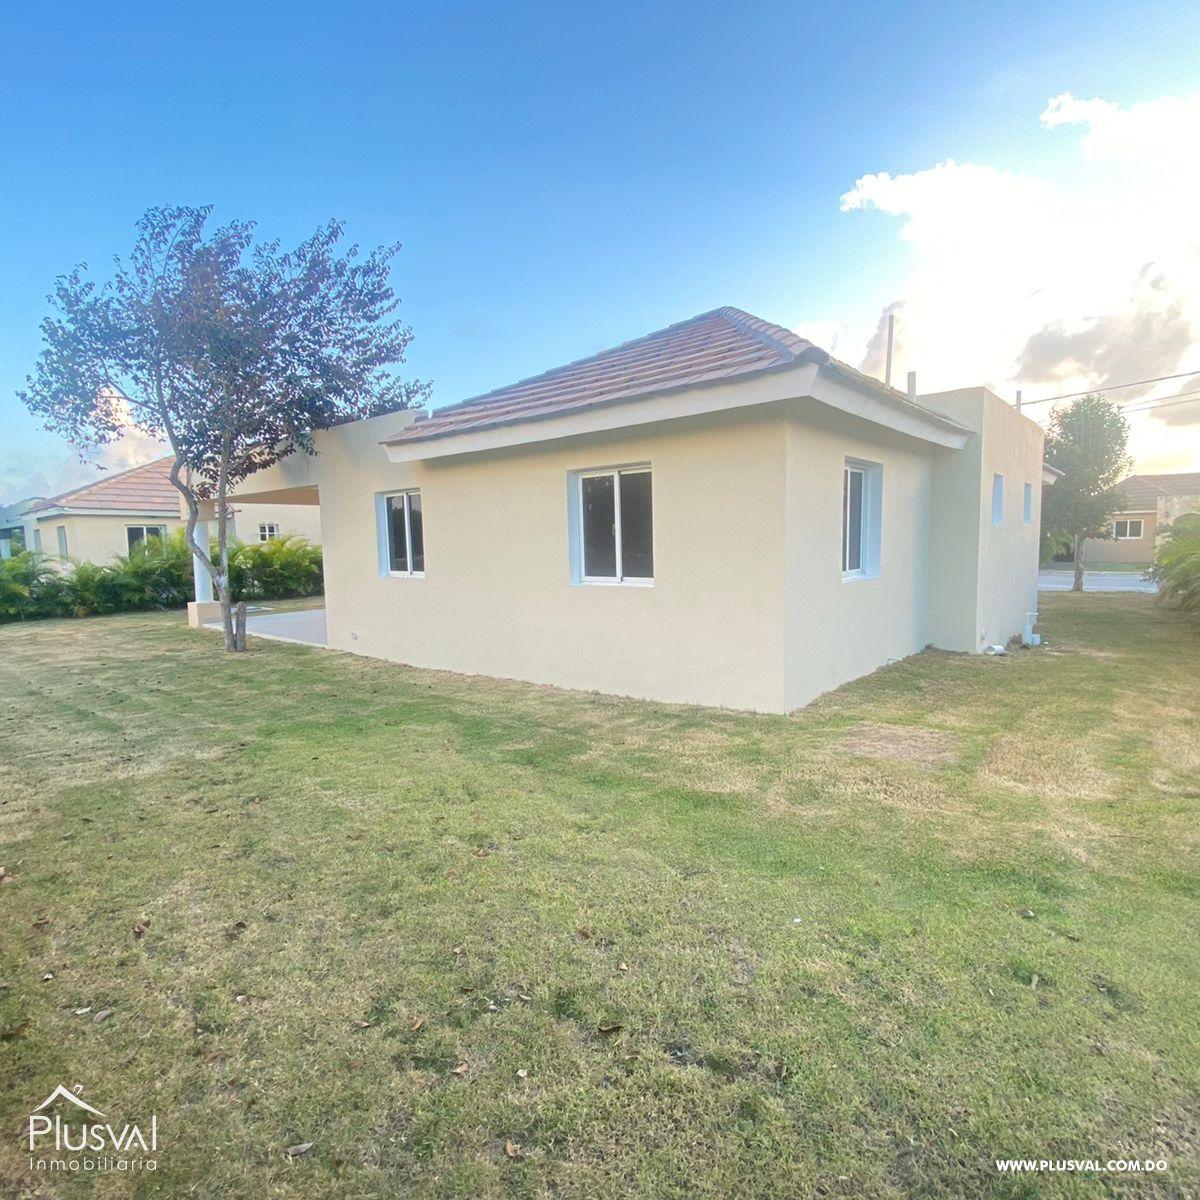 Proyecto exclusivo de casas con piscina en Punta Cana 174080